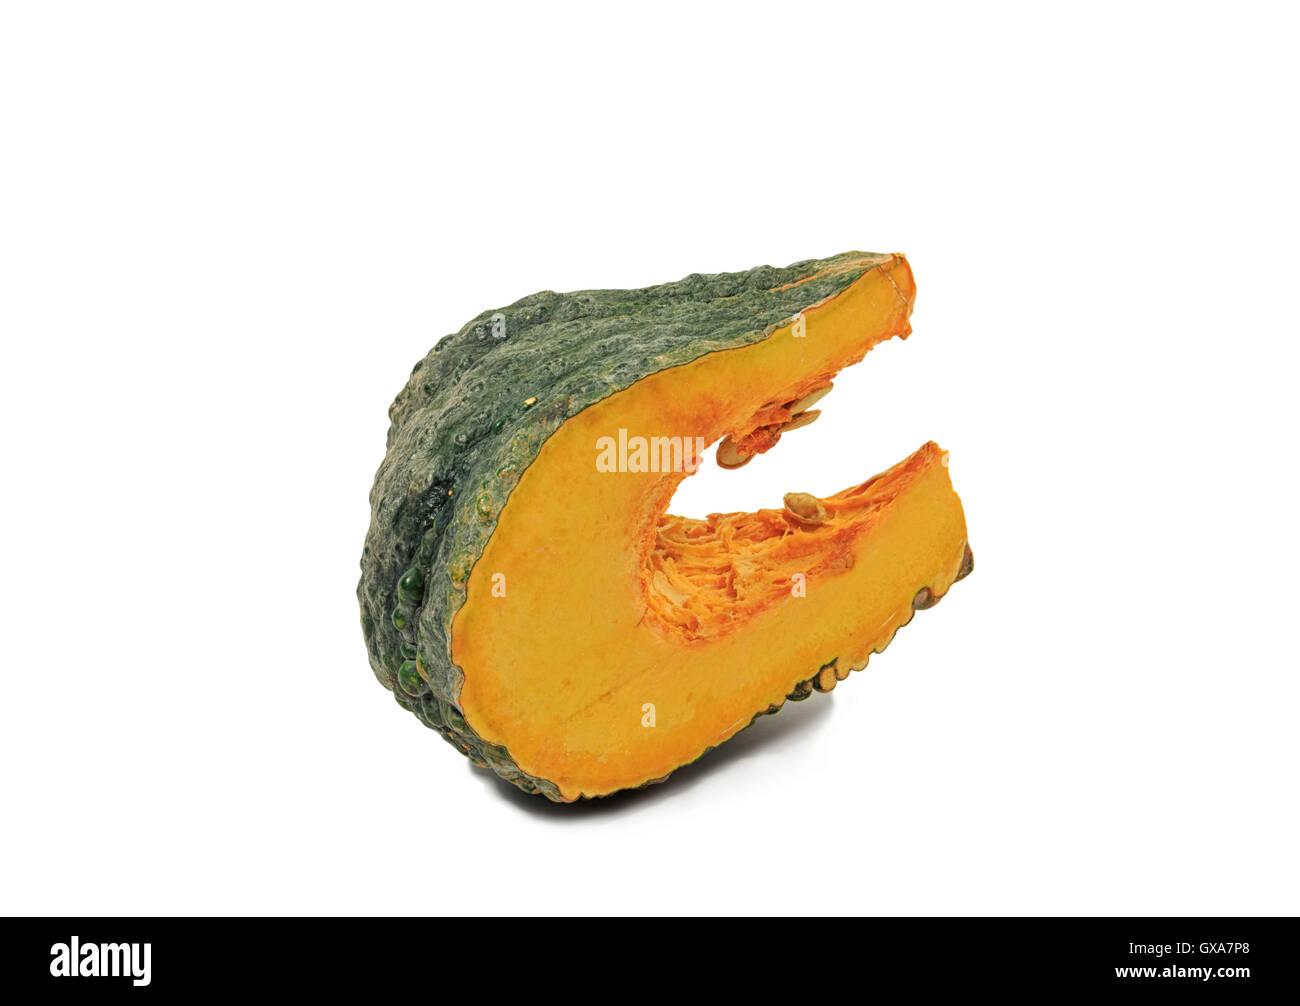 Pumpkin cut fruits using a variety of things. - Stock Image